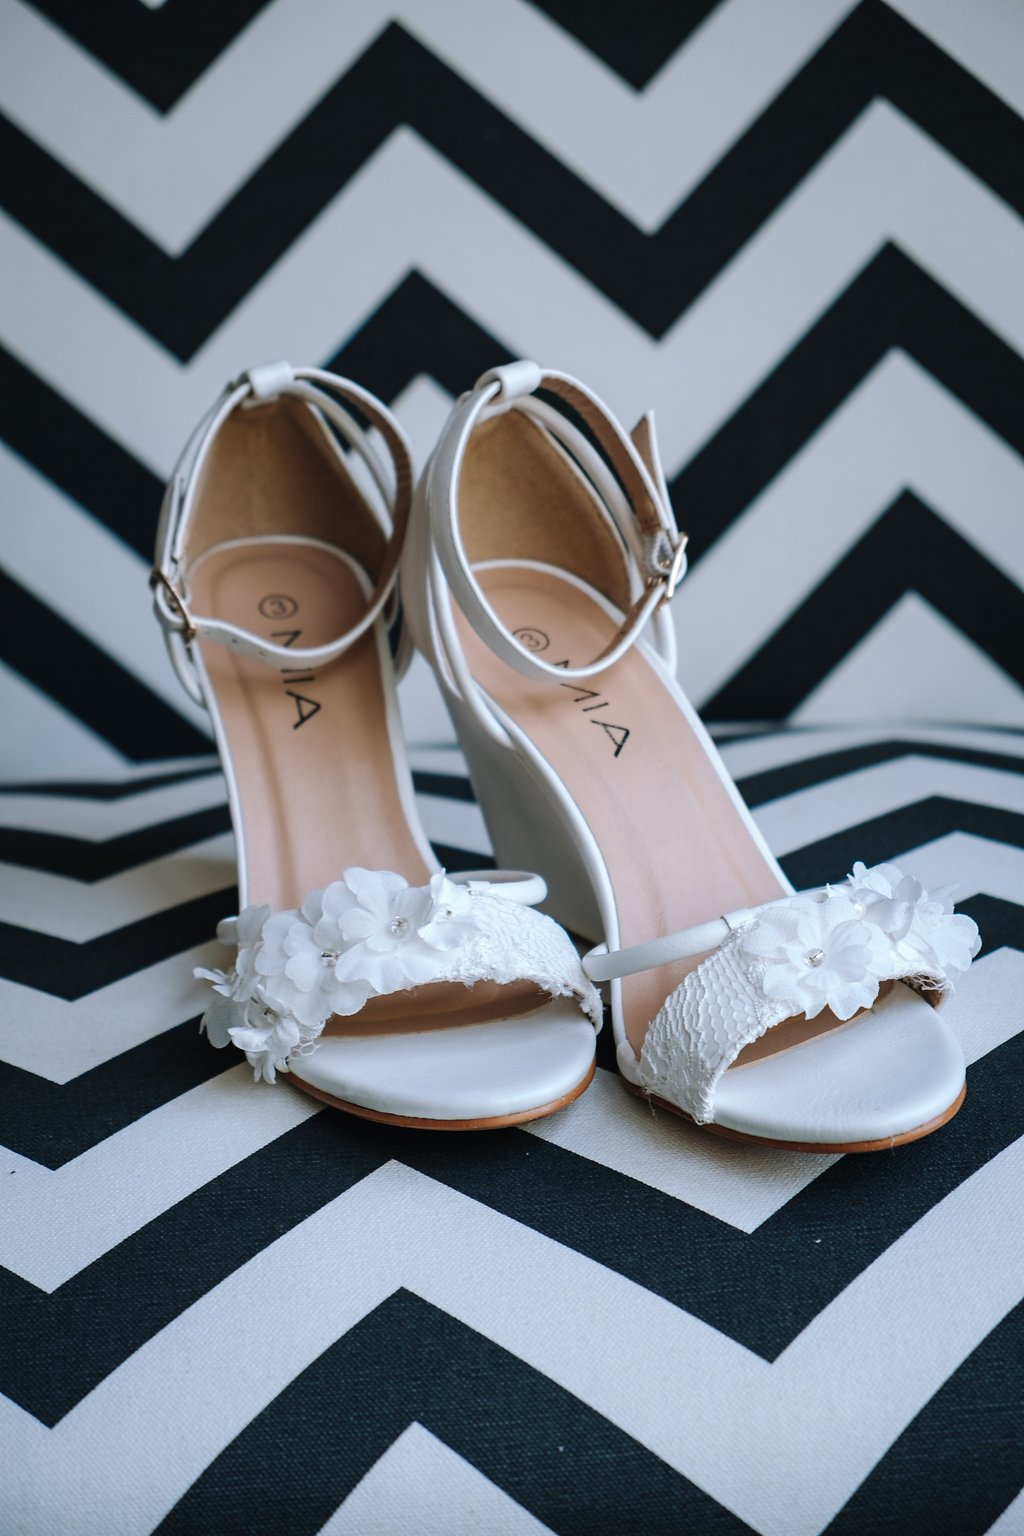 Simple White Wedding Shoes - Farm-Forest Wedding - The Overwhelmed Bride Wedding Blog